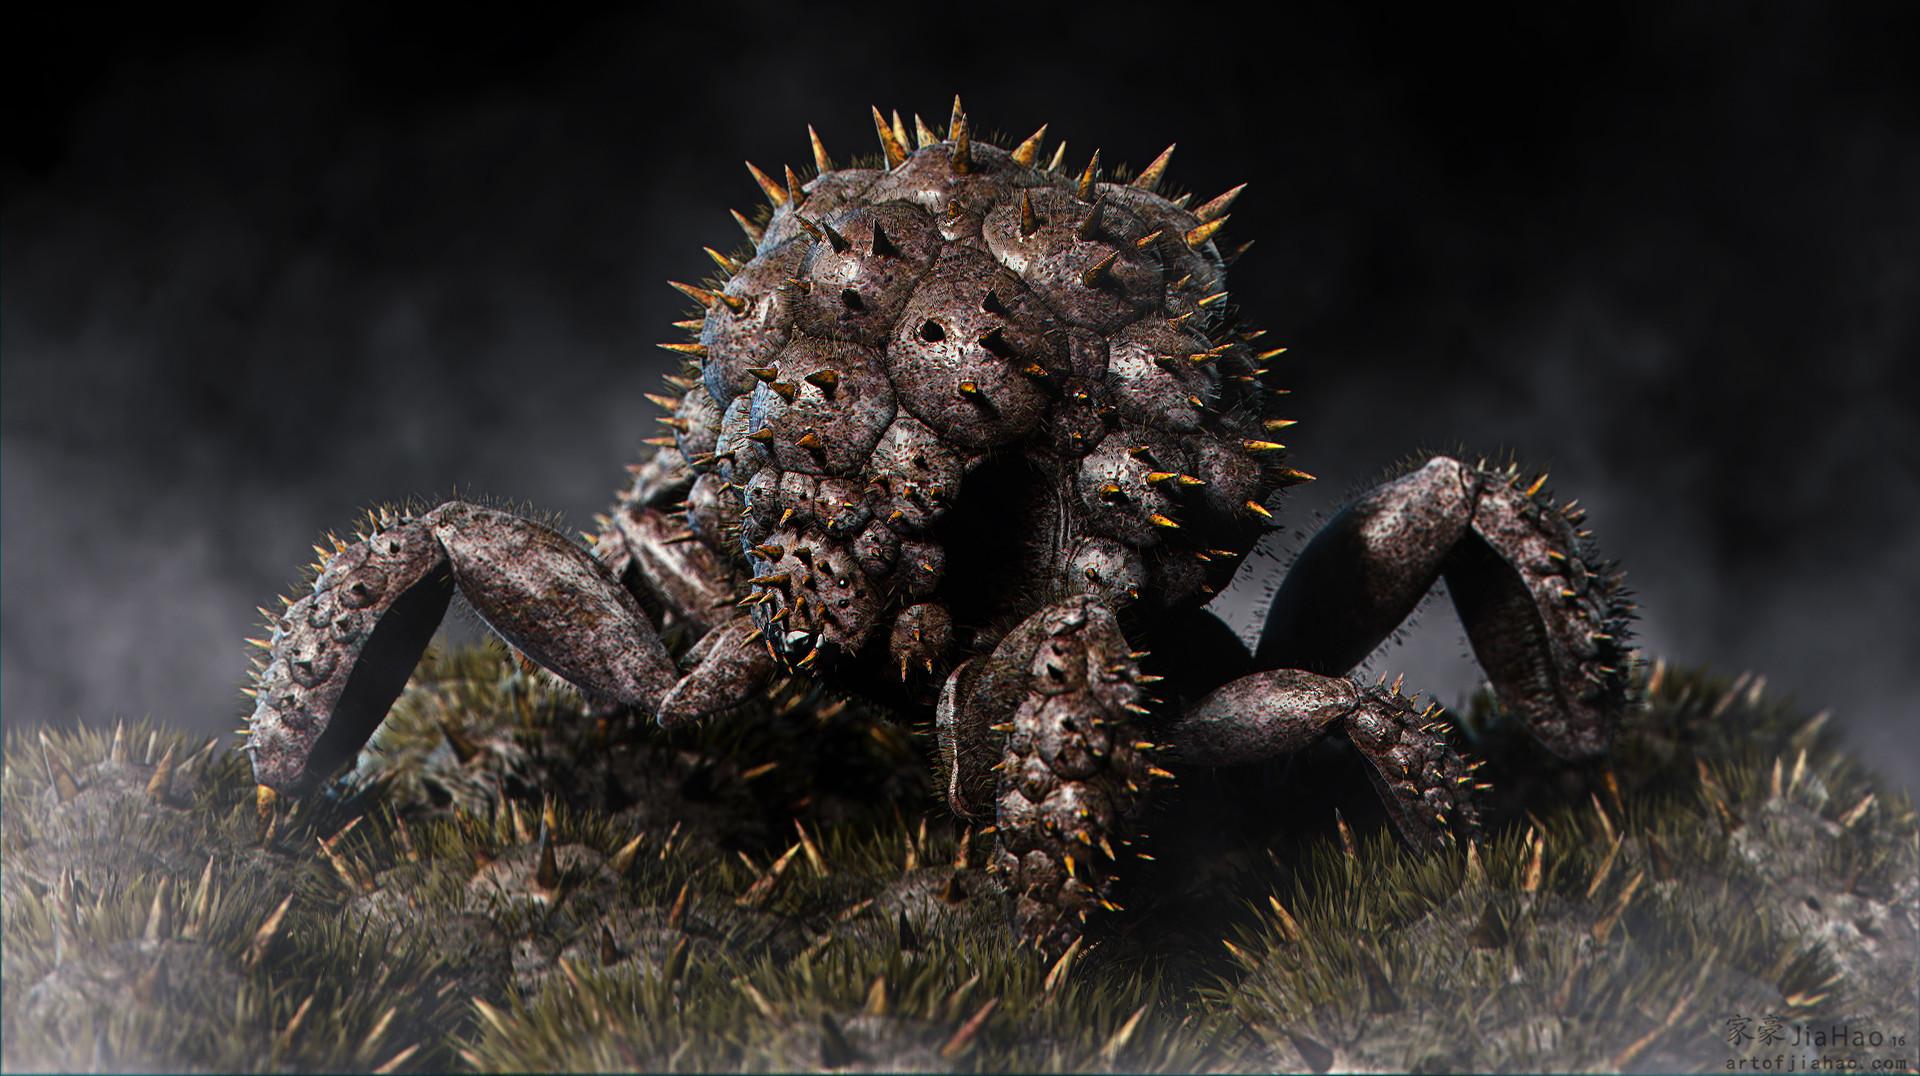 Jia hao 2016 09 spikycrabcreature comp 01 fujif125